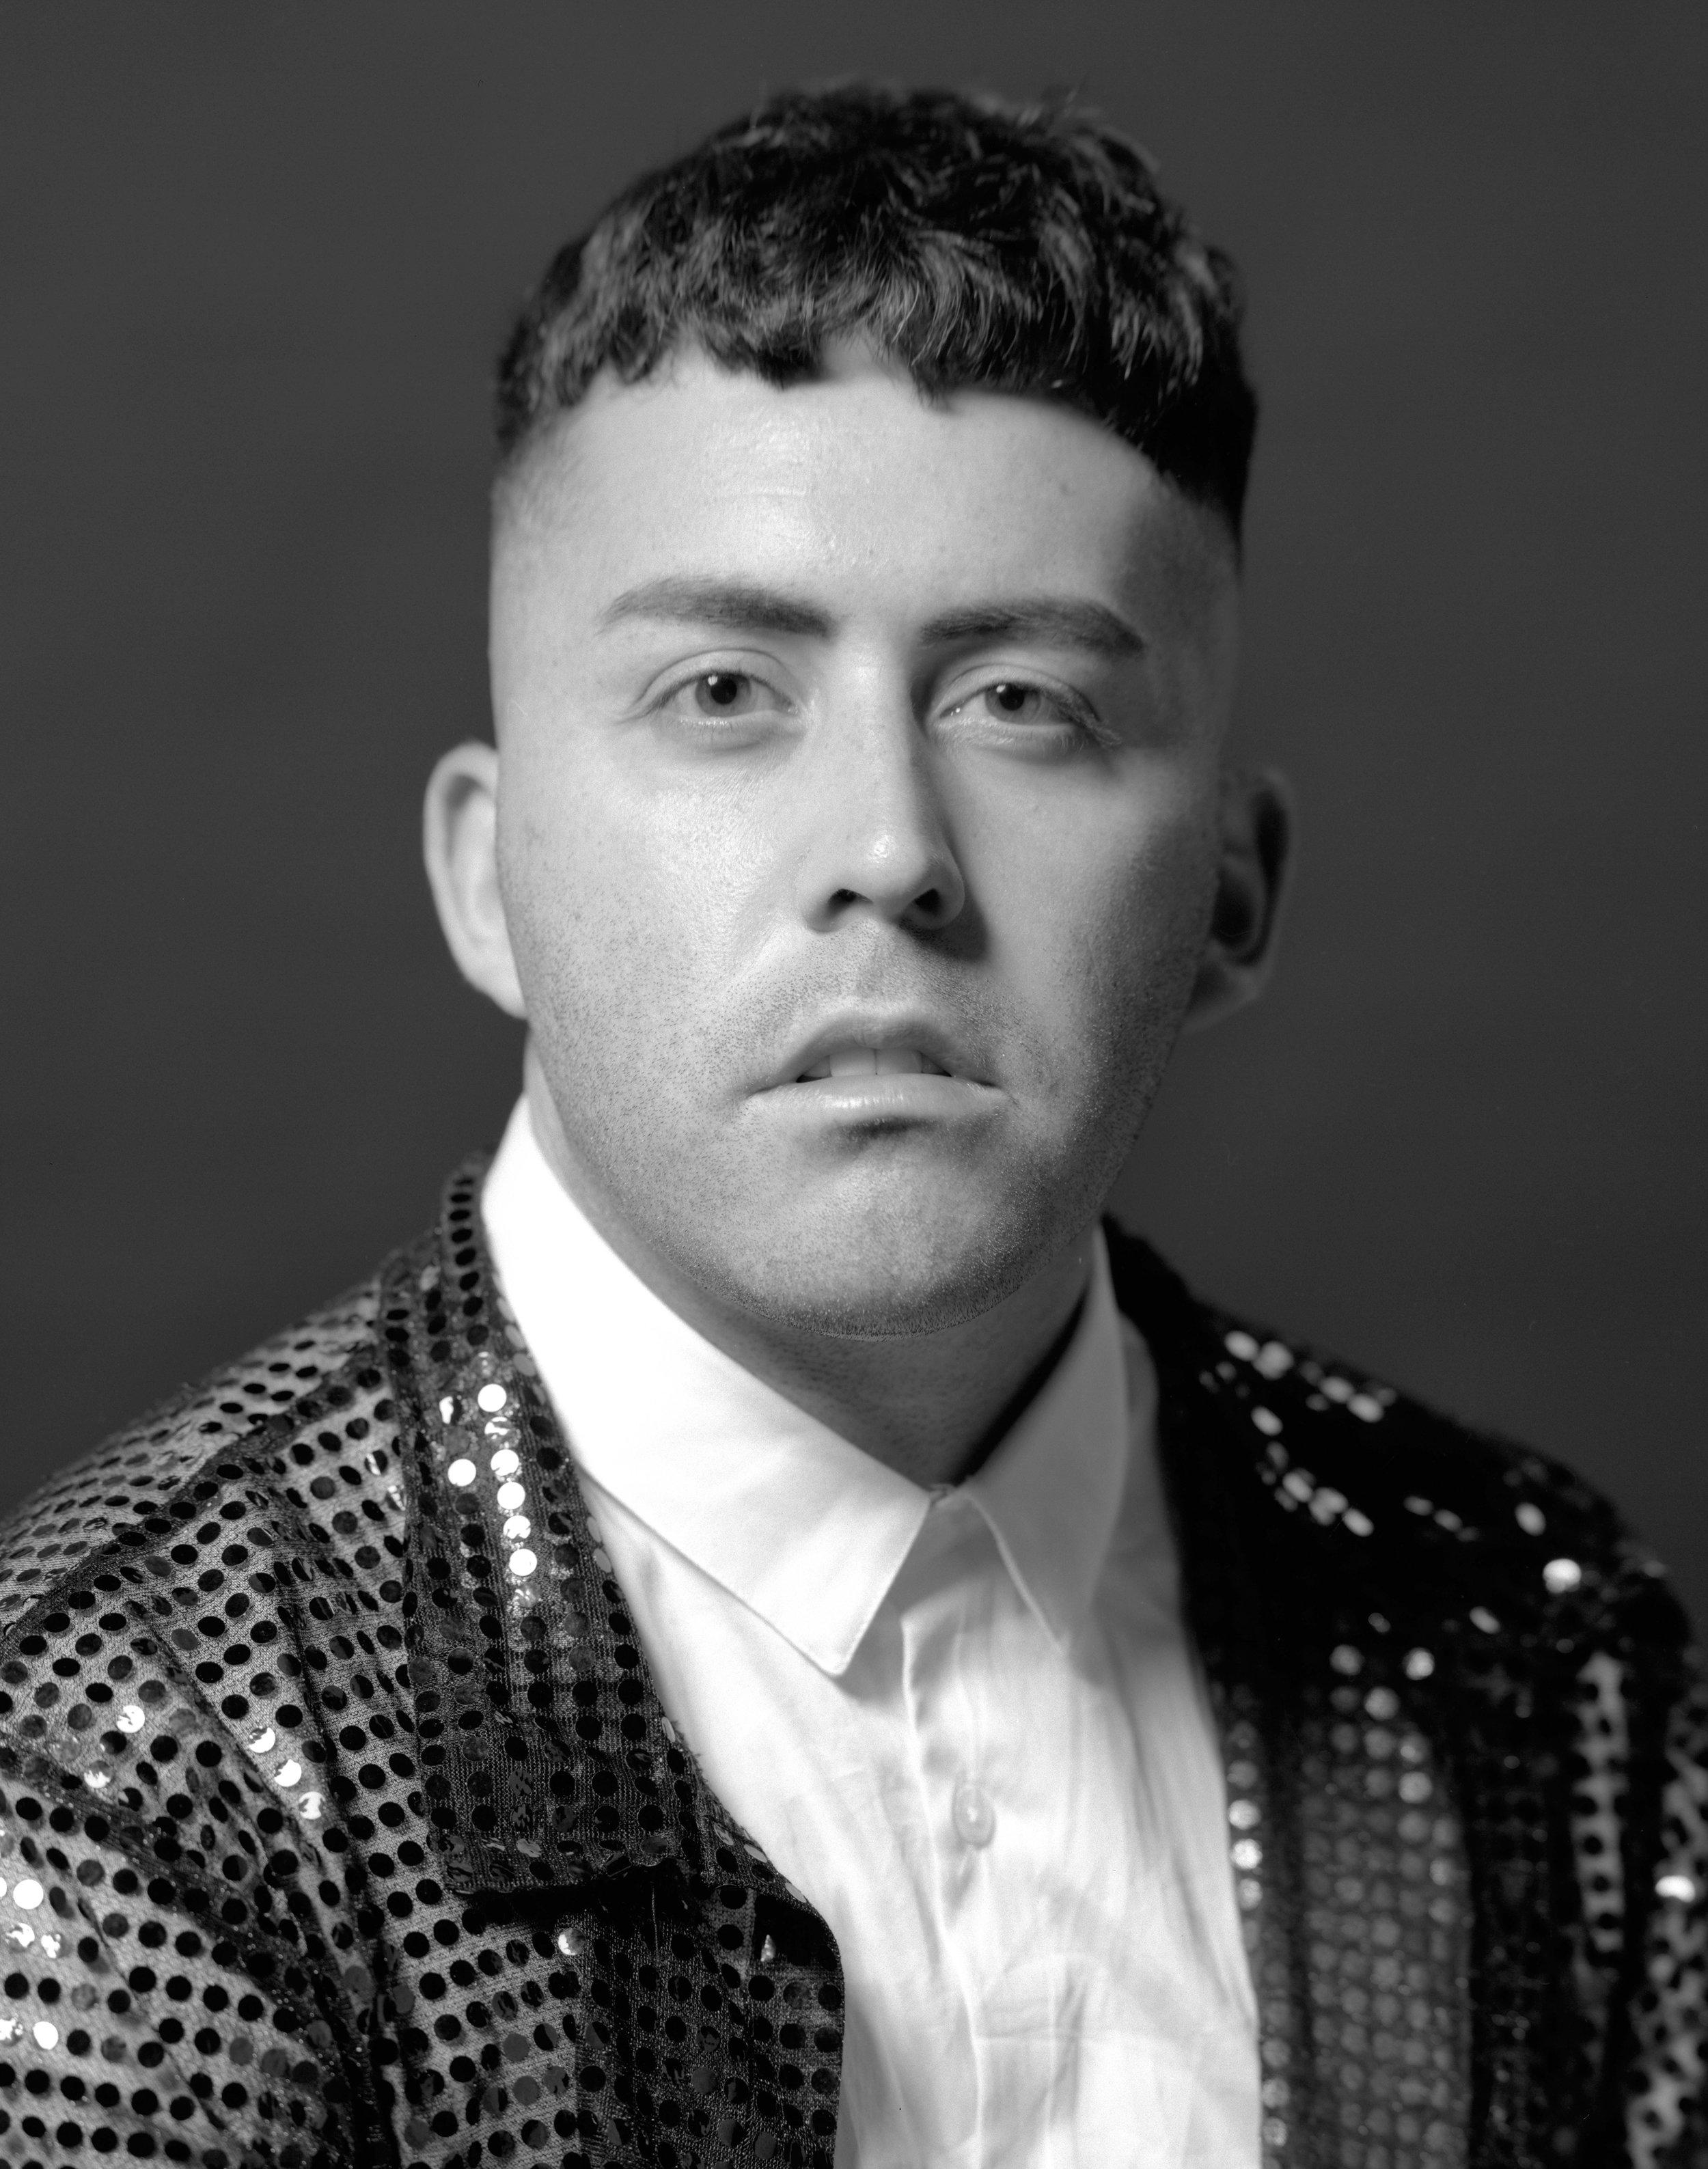 Portrait by Harrison Glazier, styled by Leland